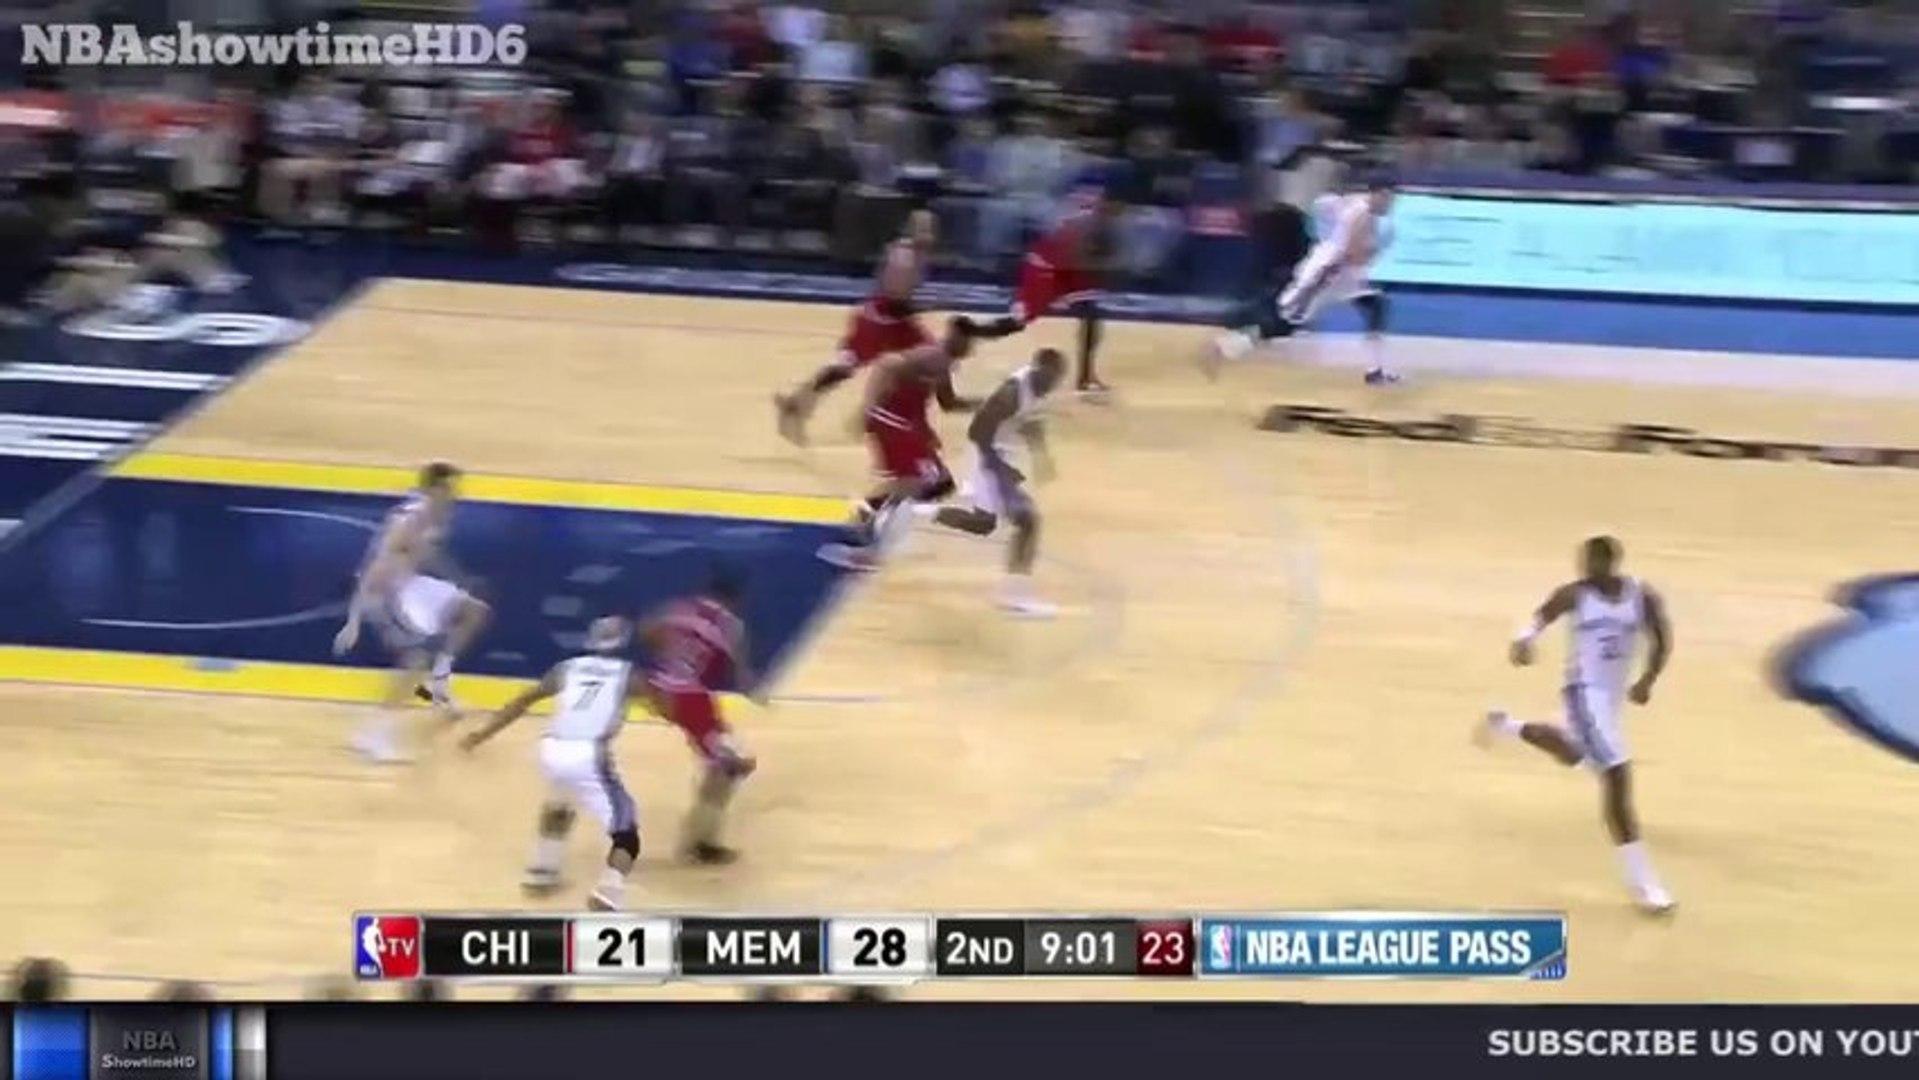 Taj Gibson's NASTY Throwdown - Bulls vs Grizzlies - December 30, 2013 - NBA 2013-2014 Season